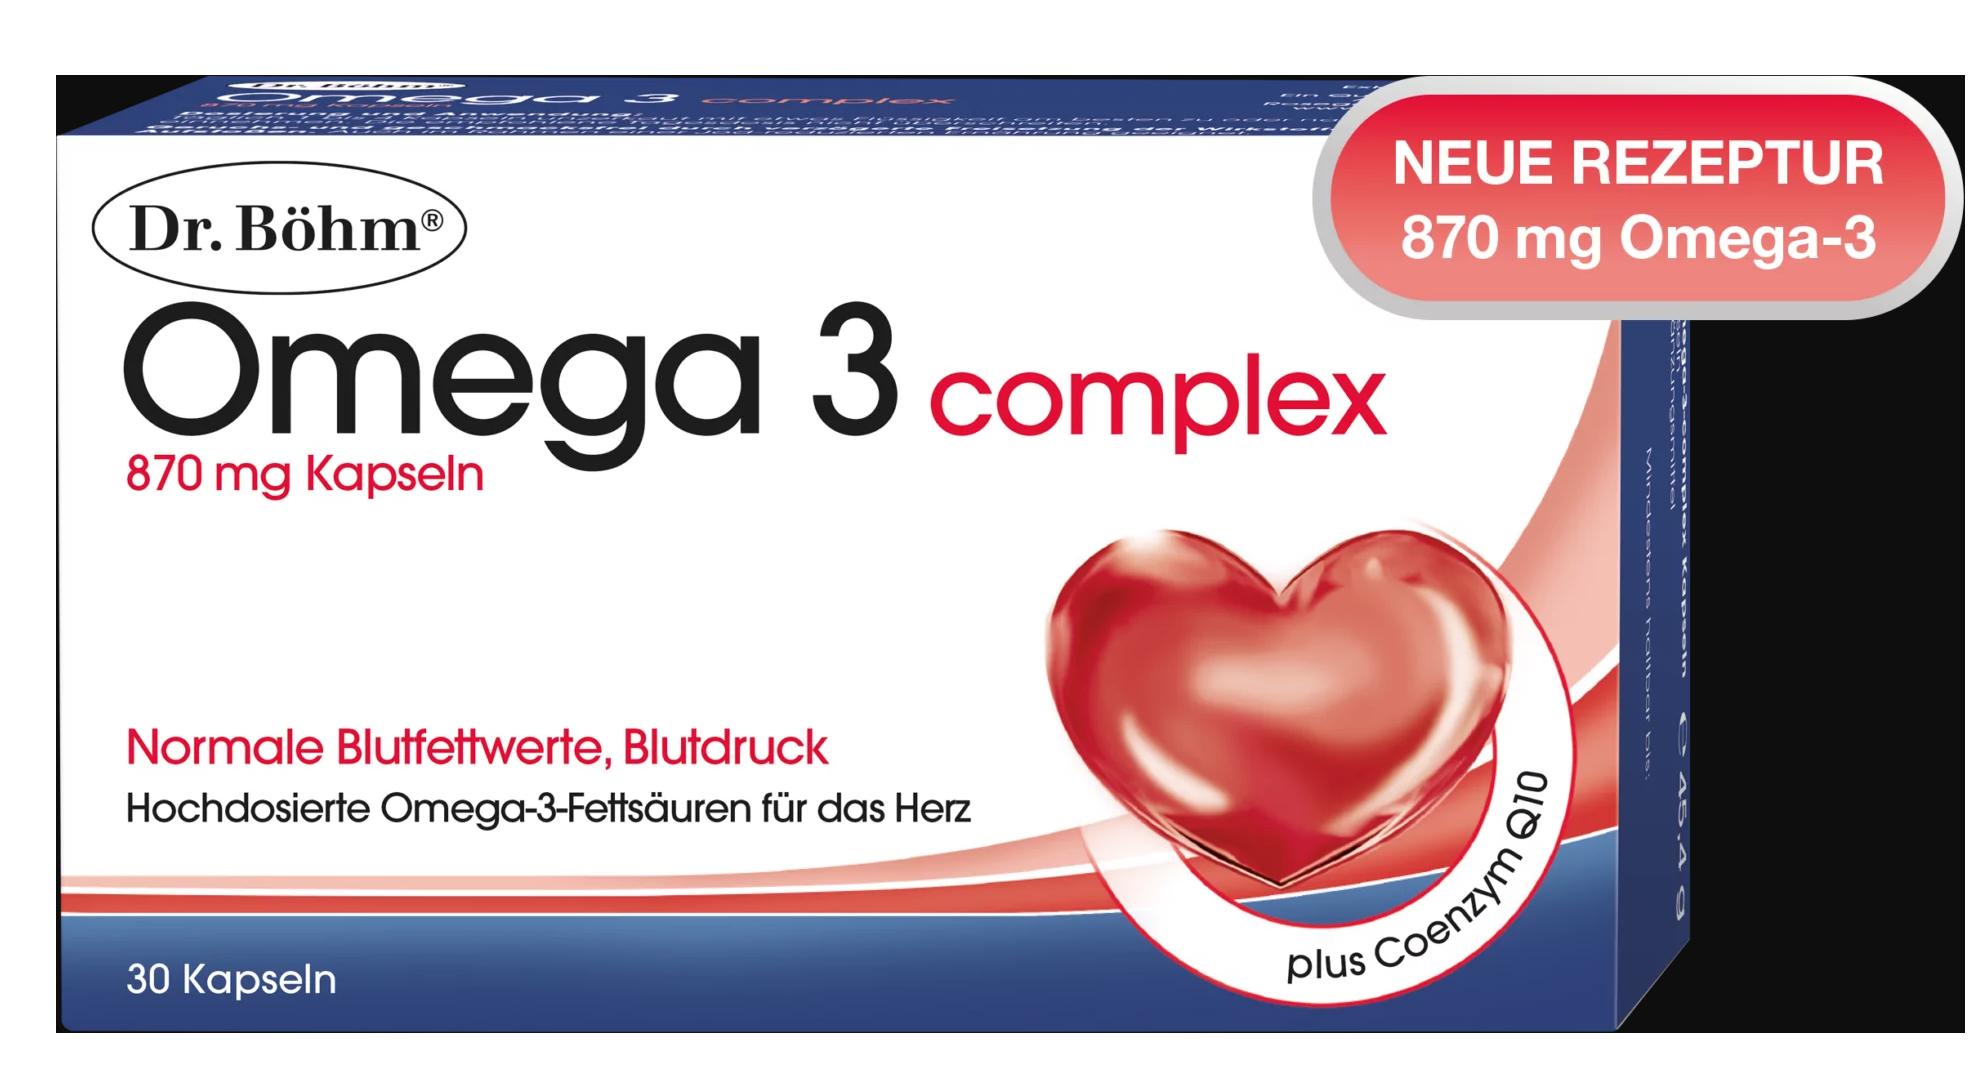 Omega 3 Kapseln Wirkung